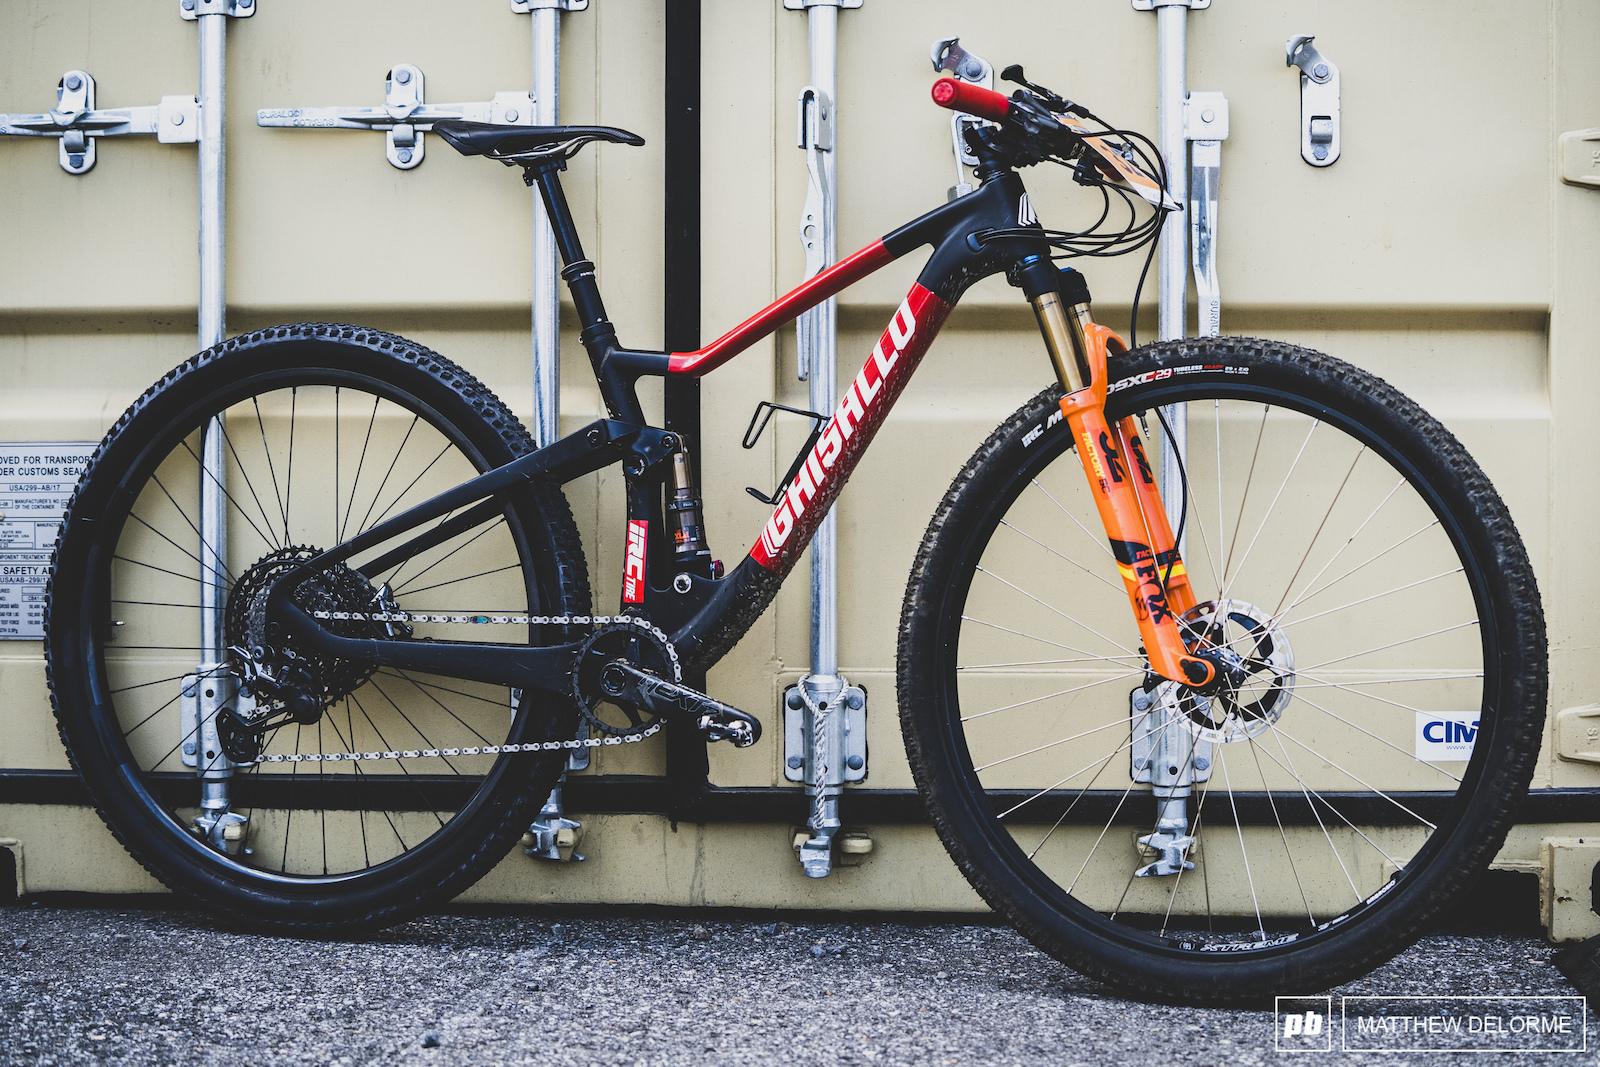 Meet the Ghisallo a Japanese bike that looks a little bit like a Scott Spark.